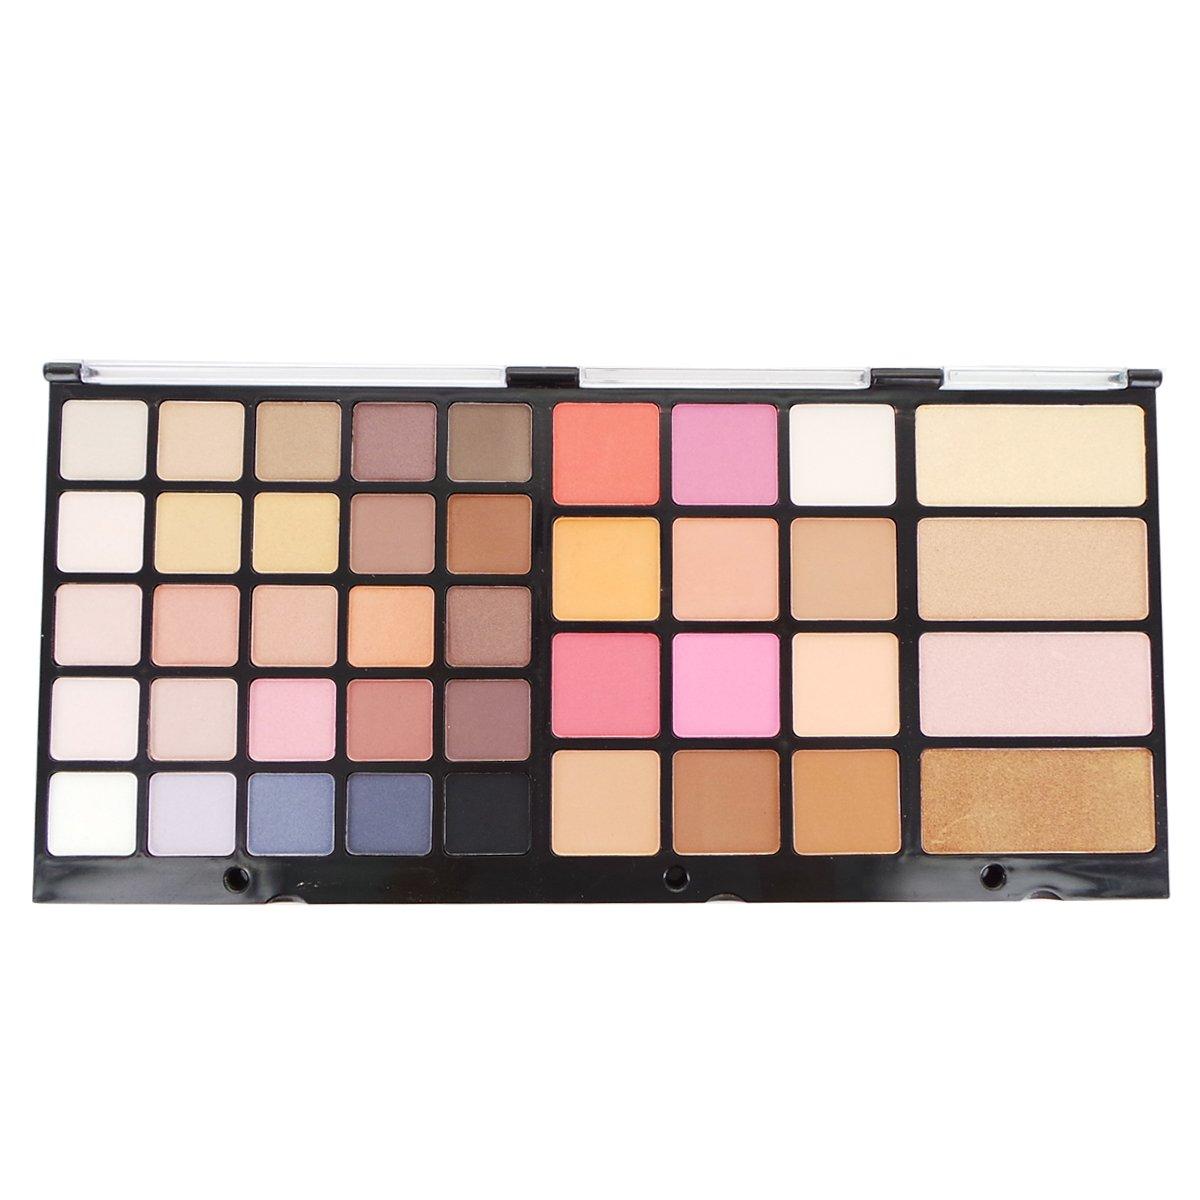 (6 Pack) OKALAN Pro Makeup Palette (並行輸入品) B079VKW7W7